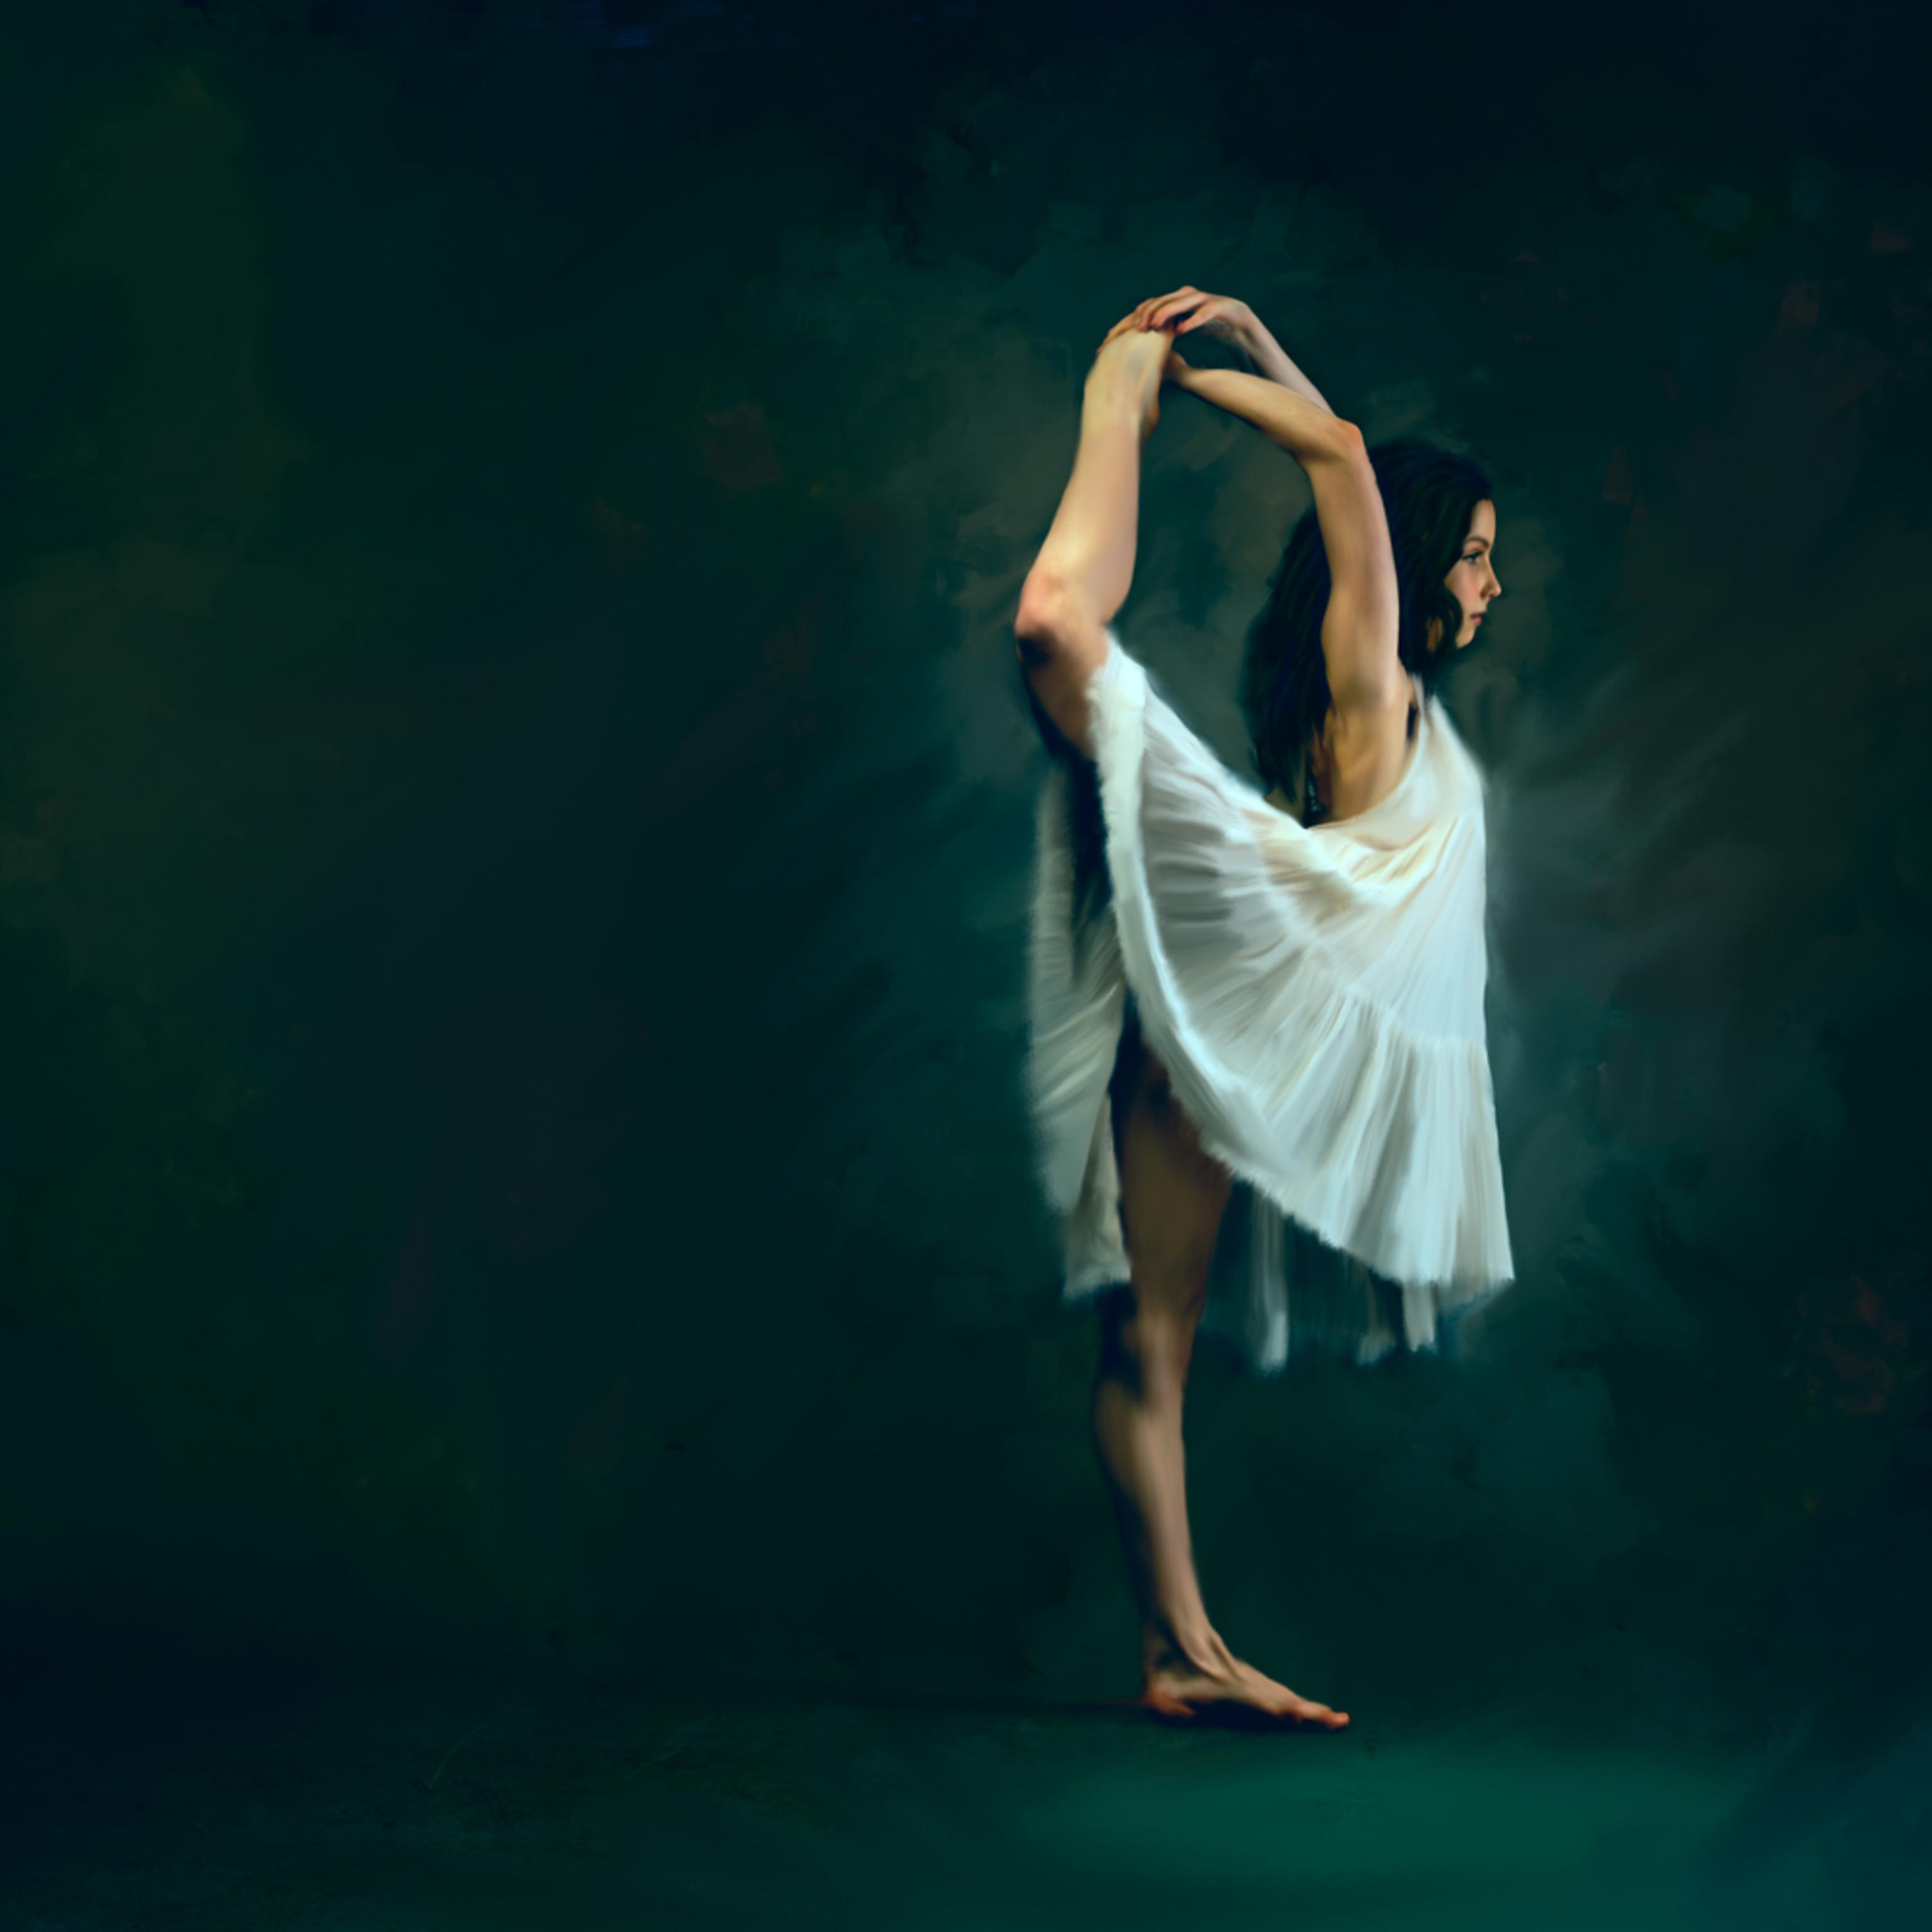 20200301 dance photography experience workshop 0150 edit edit obcvi2